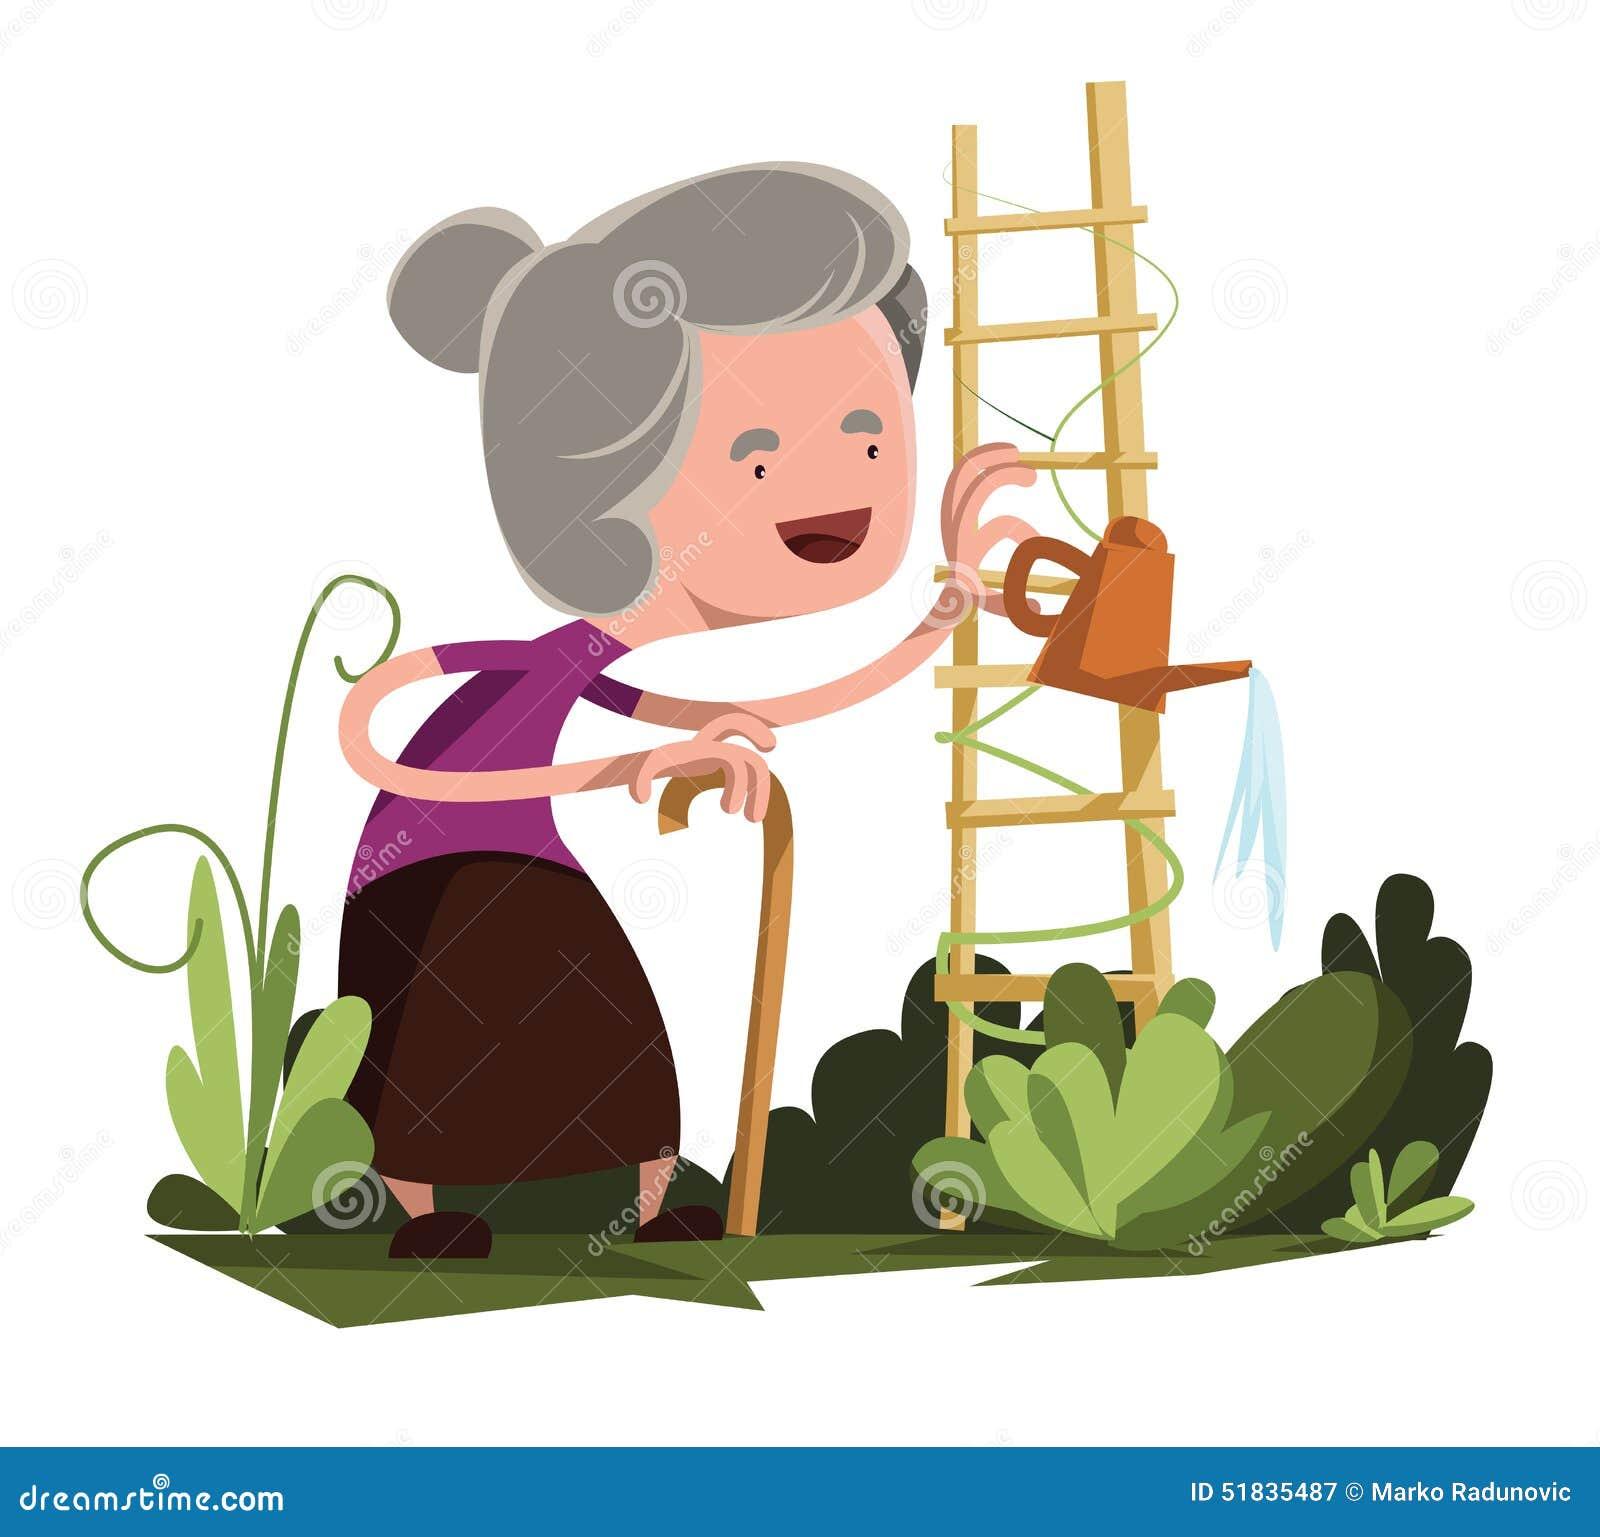 Old granny watering garden illustration cartoon character. Enjoy :).